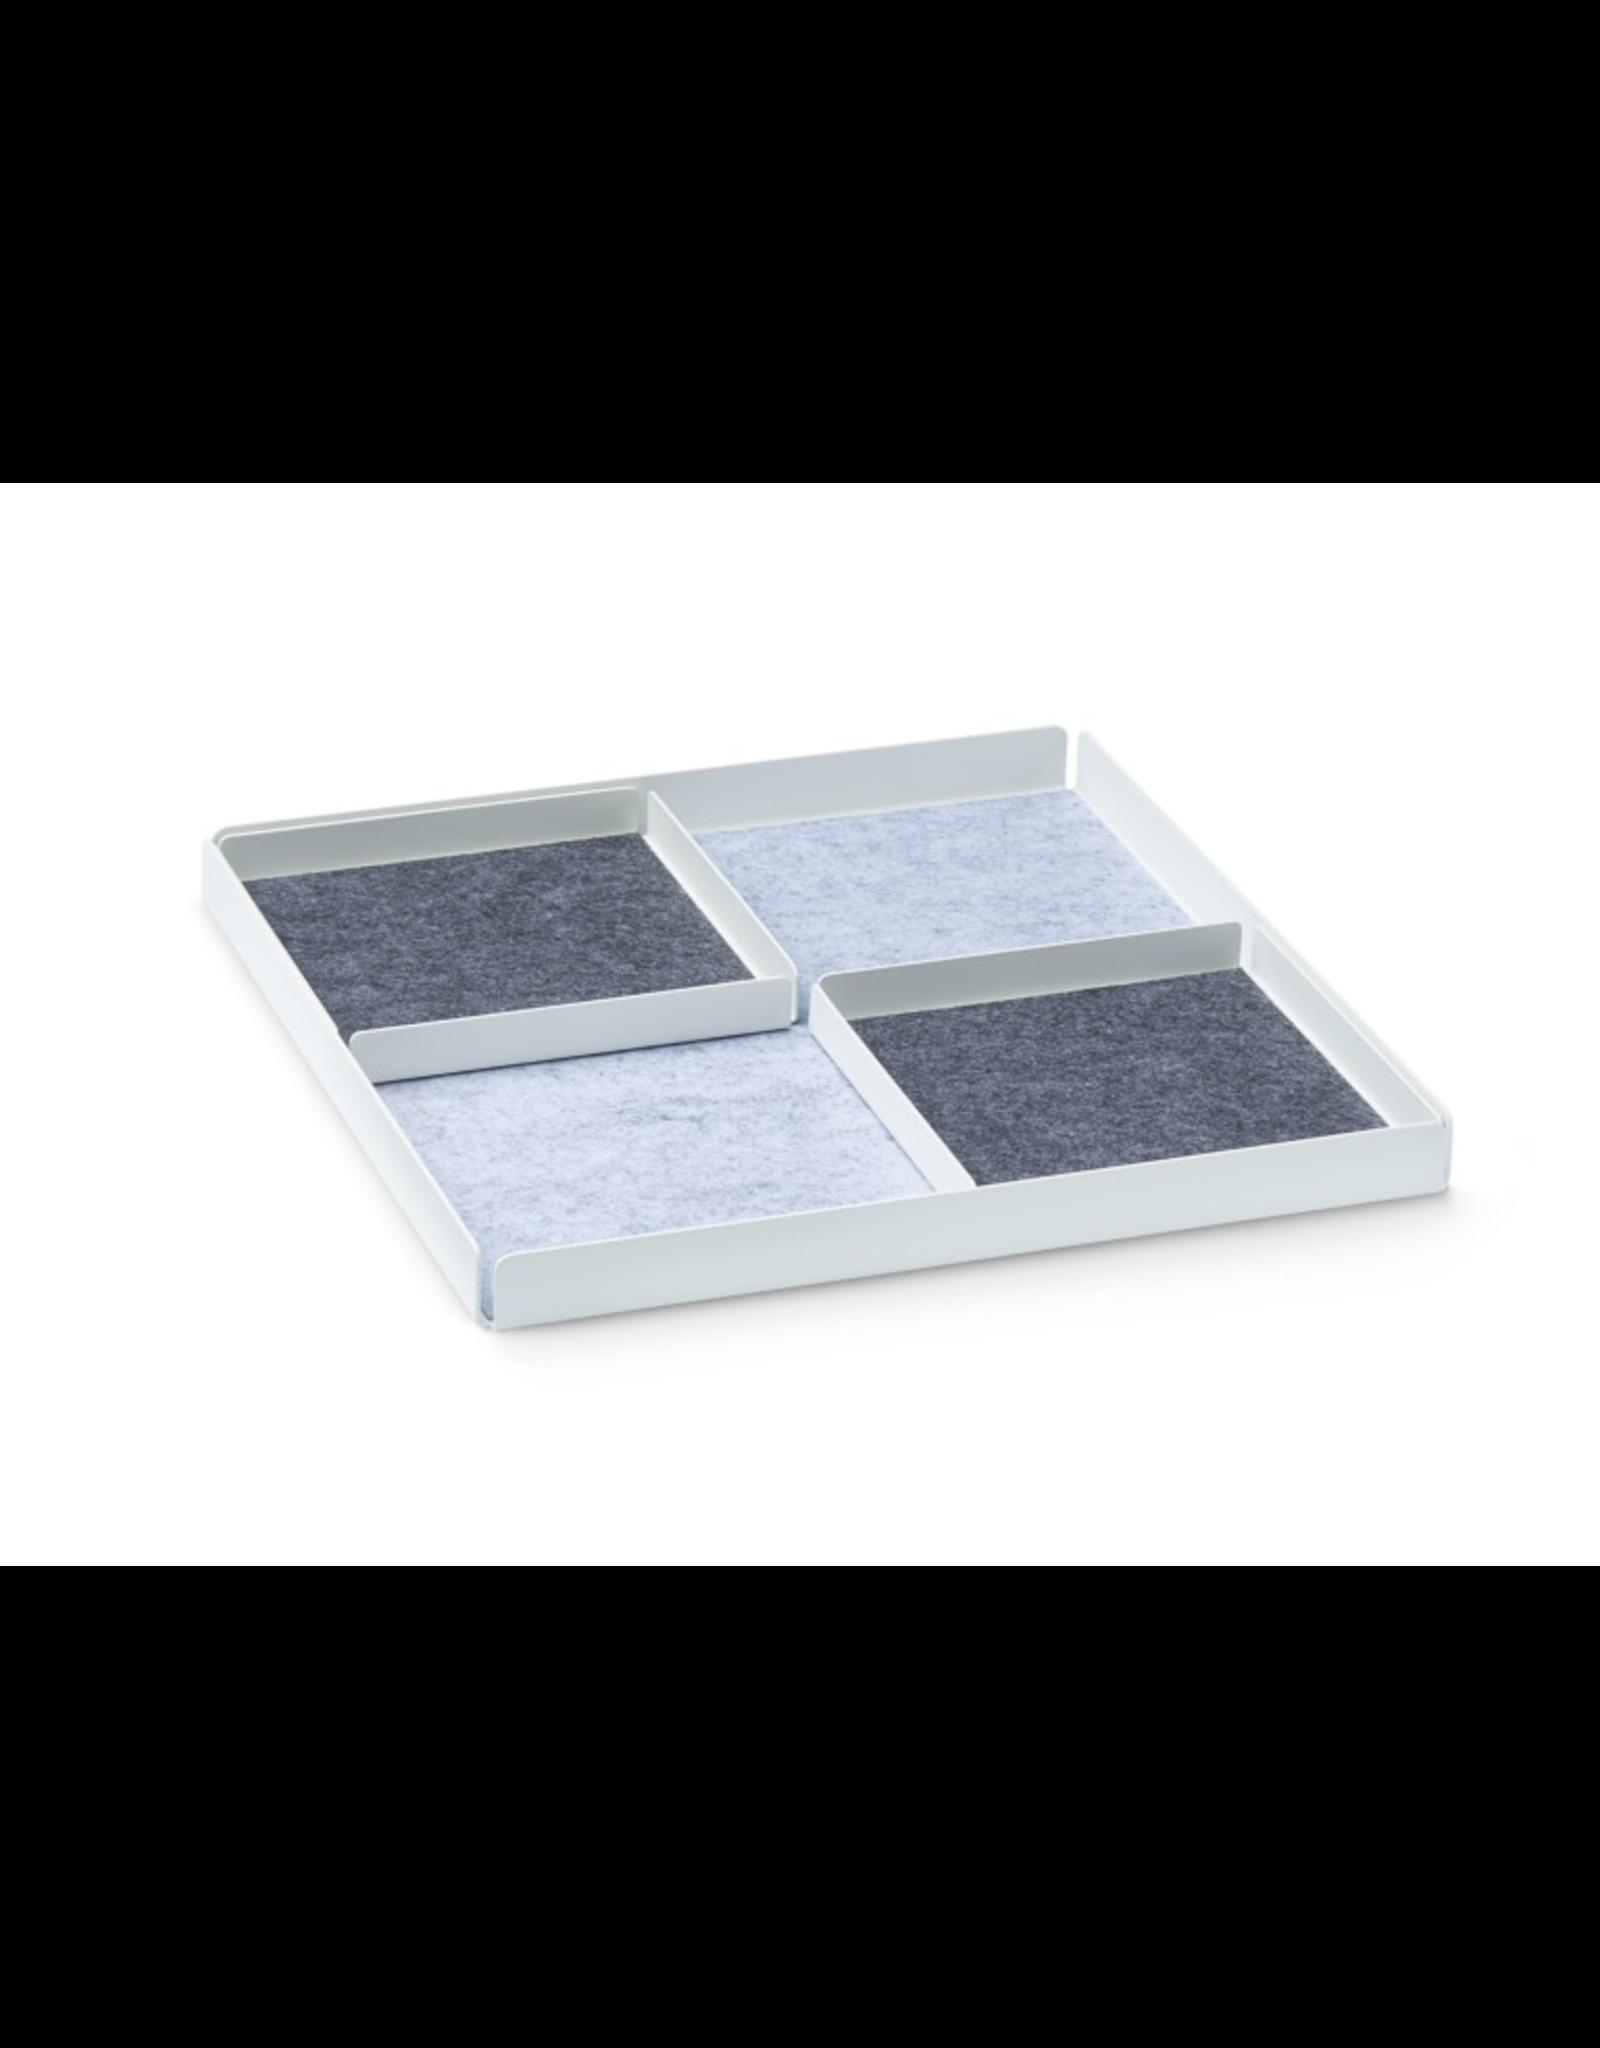 NAV Scandinavia POCKET REST X Organizer Tray Set Set de 3 pièces. - Blanc / Gris